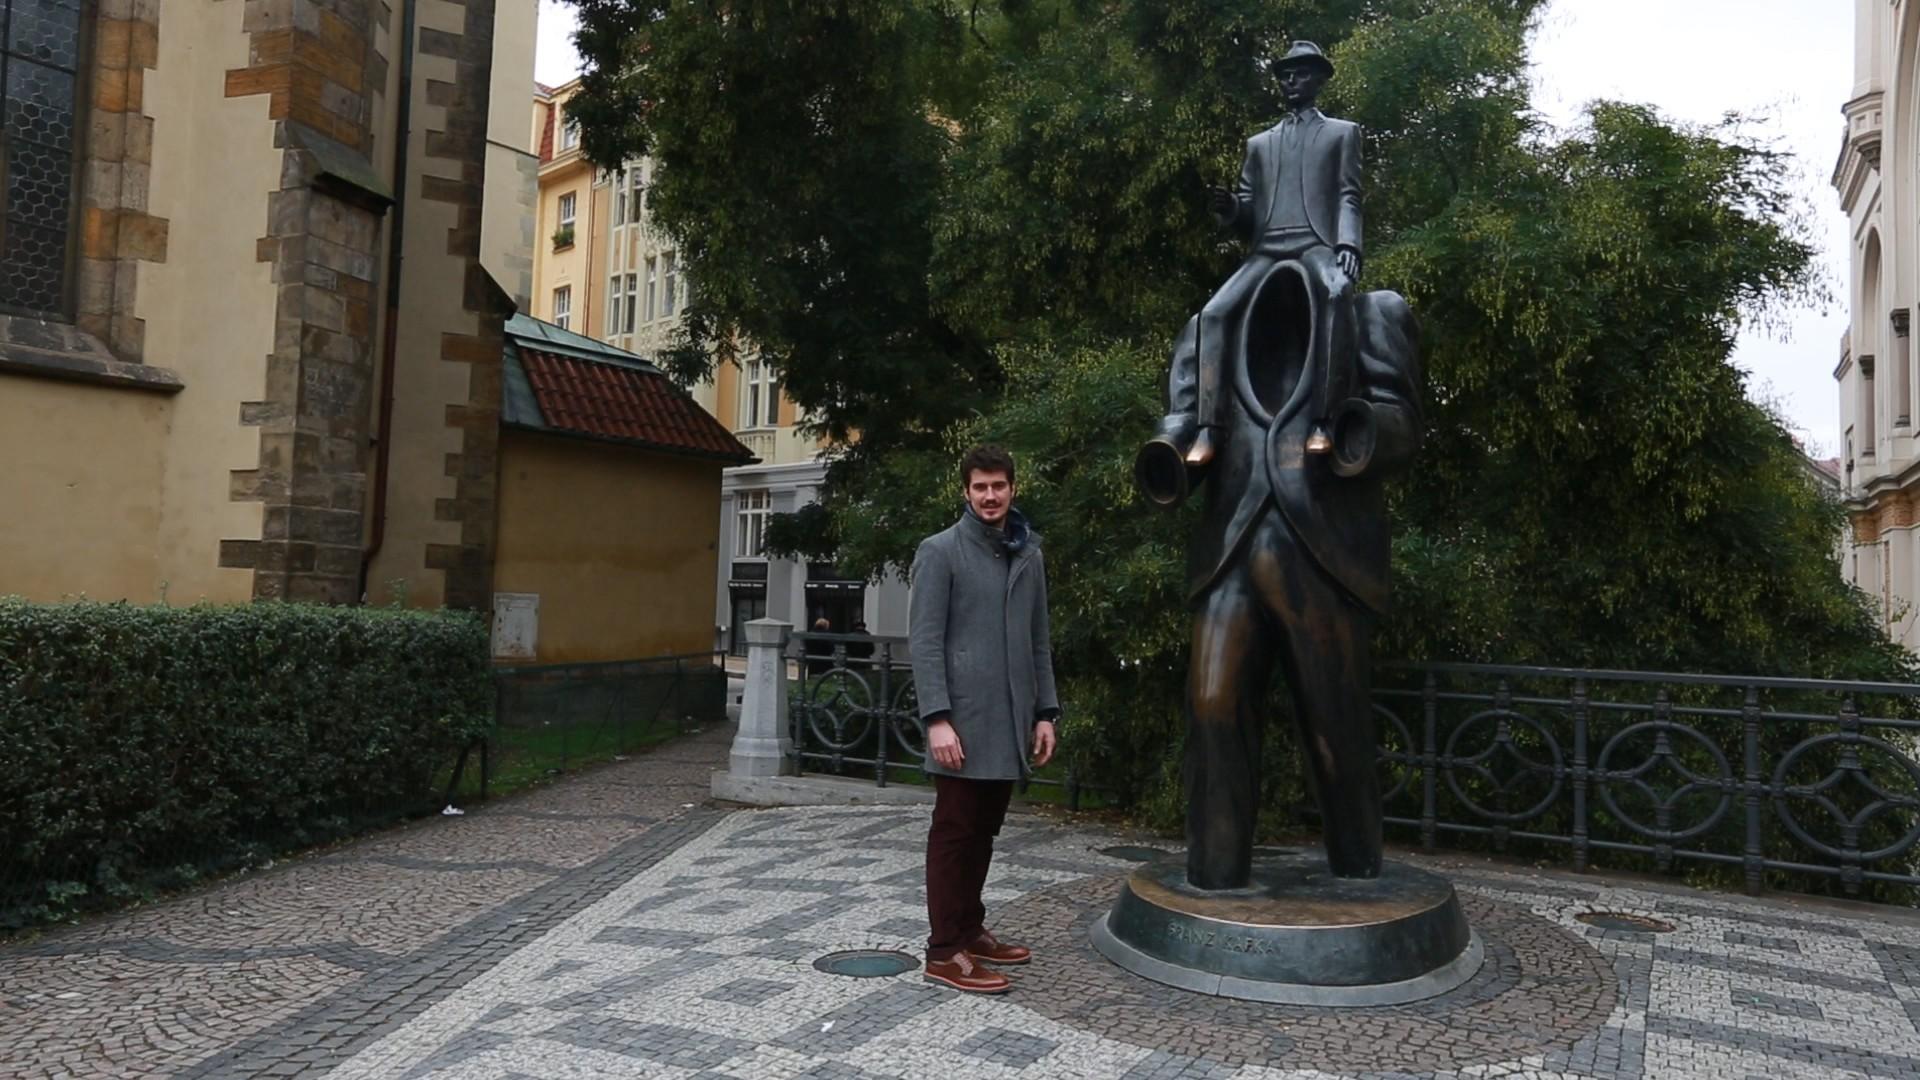 Pedro Vedova em Praga (Foto: GloboNews)